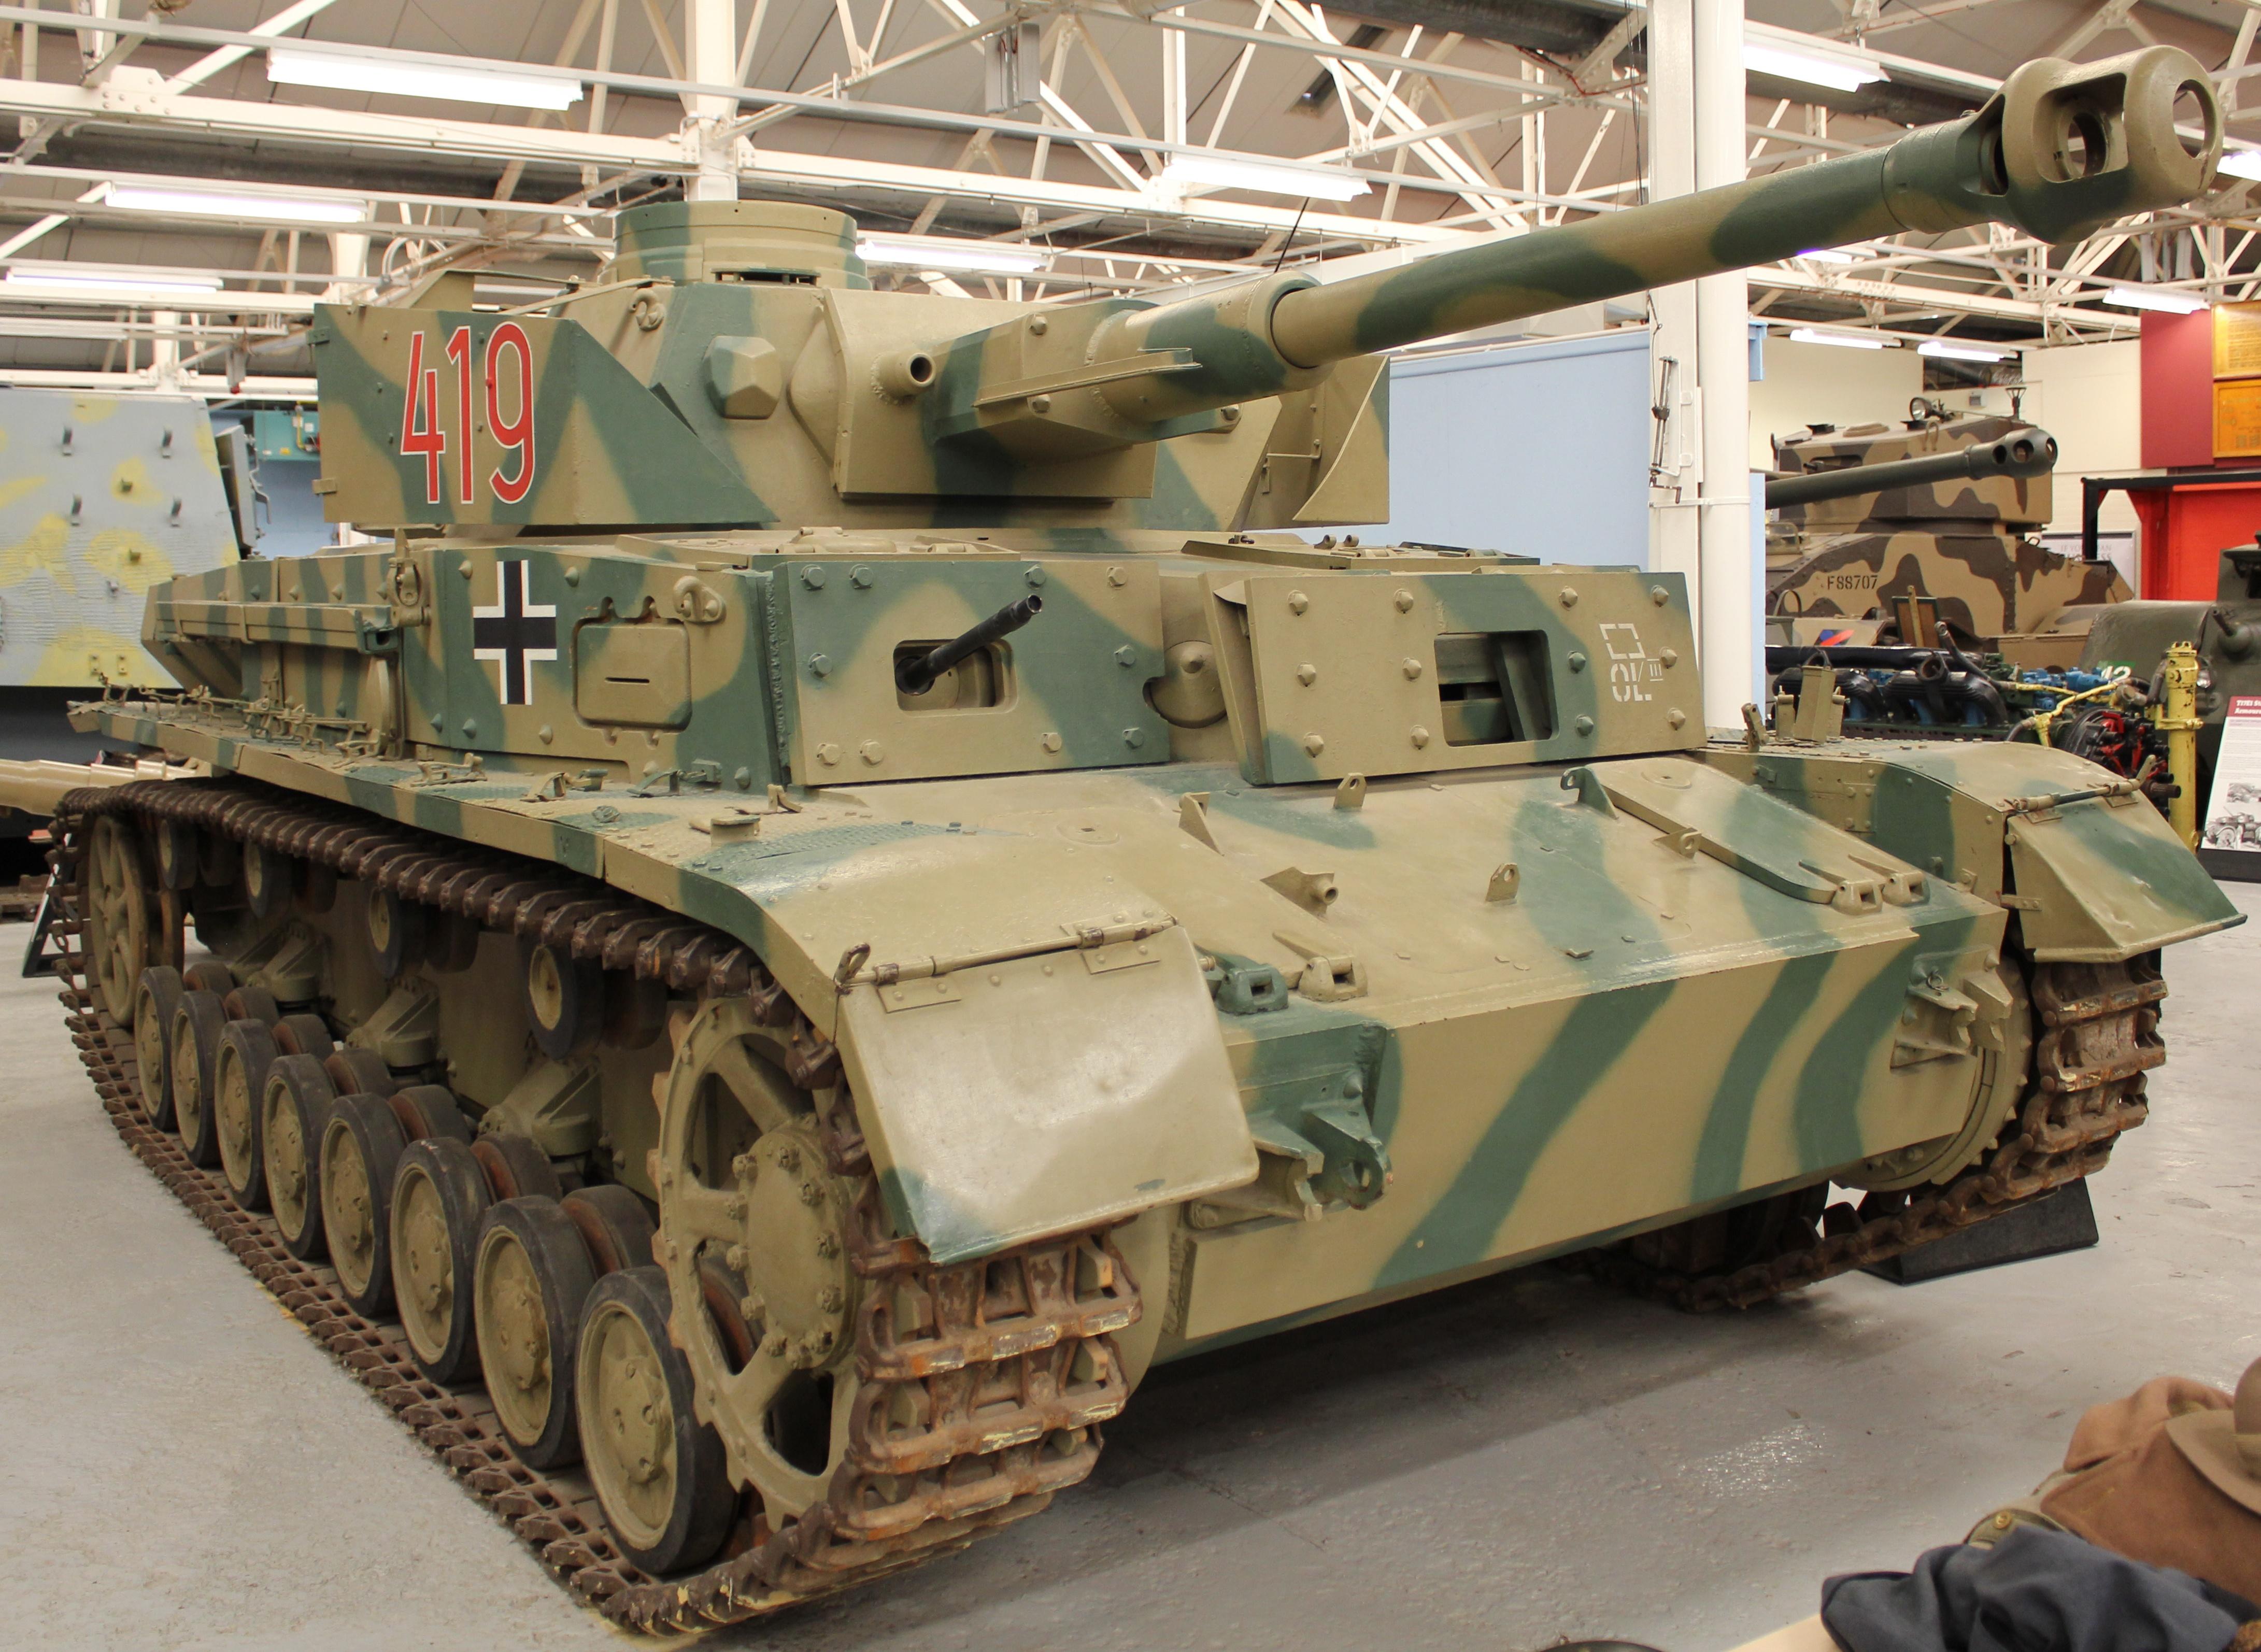 Panzerkampfwagen IV, designated T-4 in Romanian Army